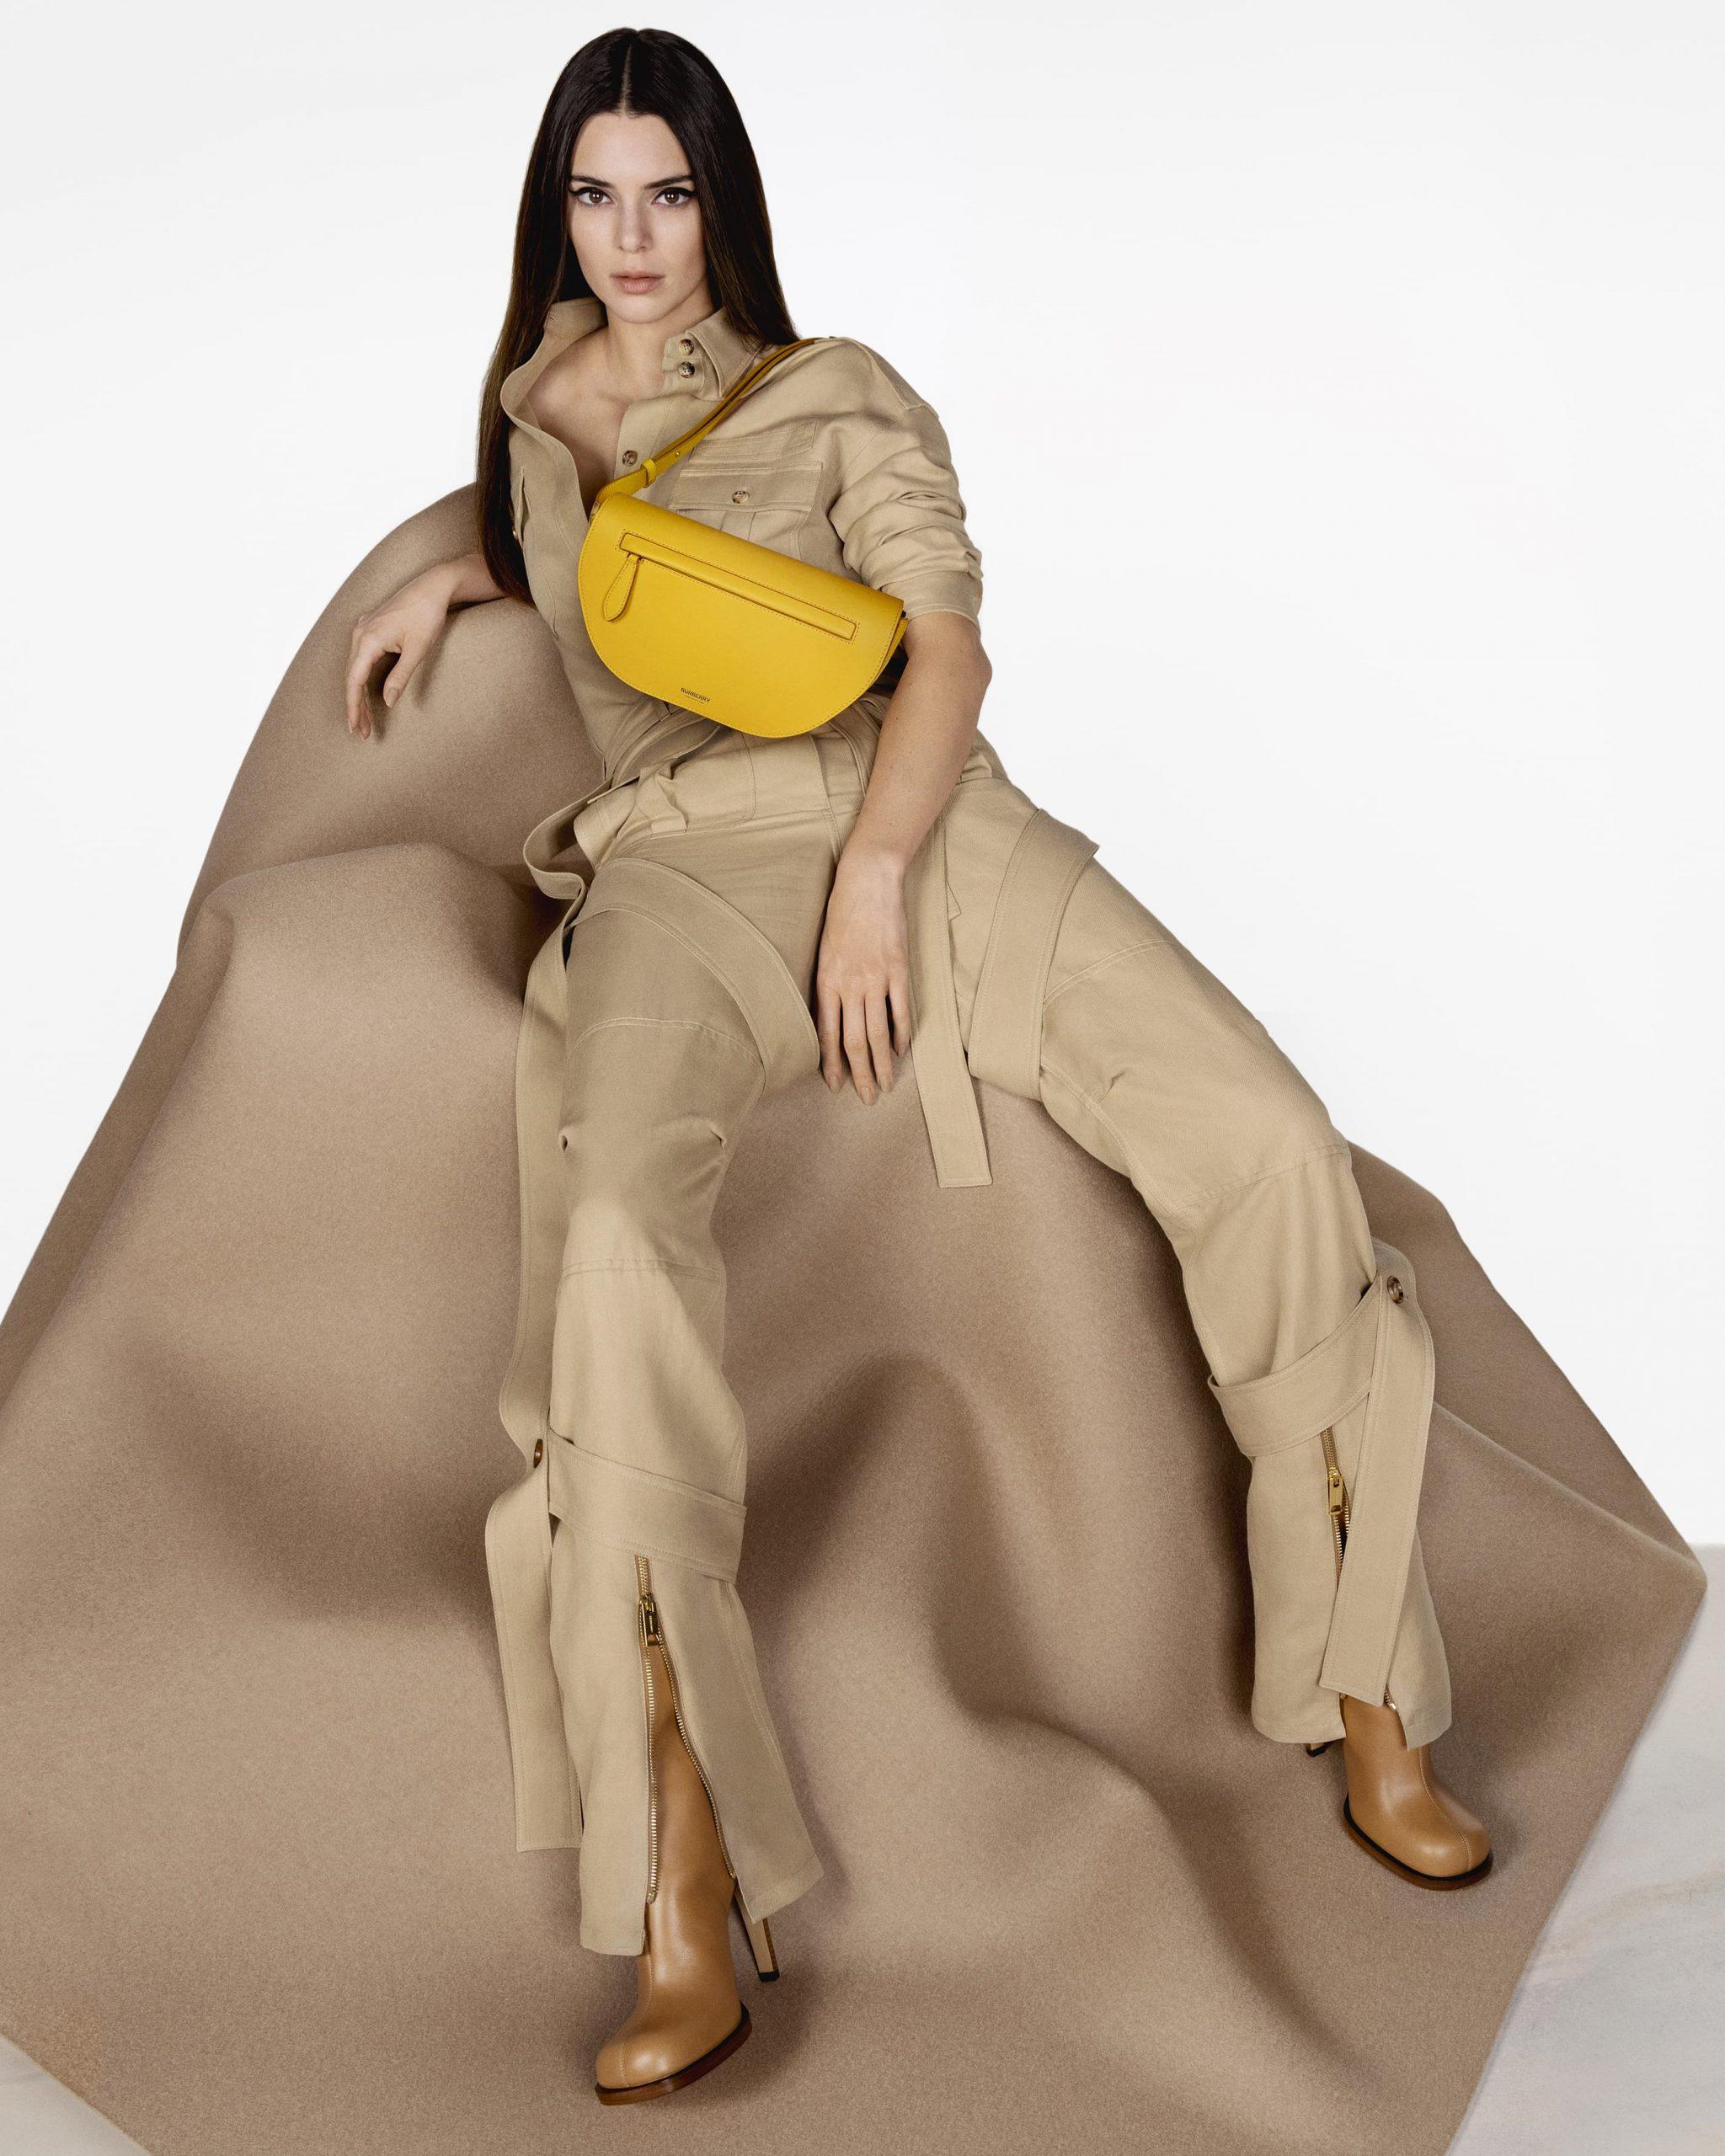 Burberry Olympia Bag Spring 2021 Ad Campaign Photos